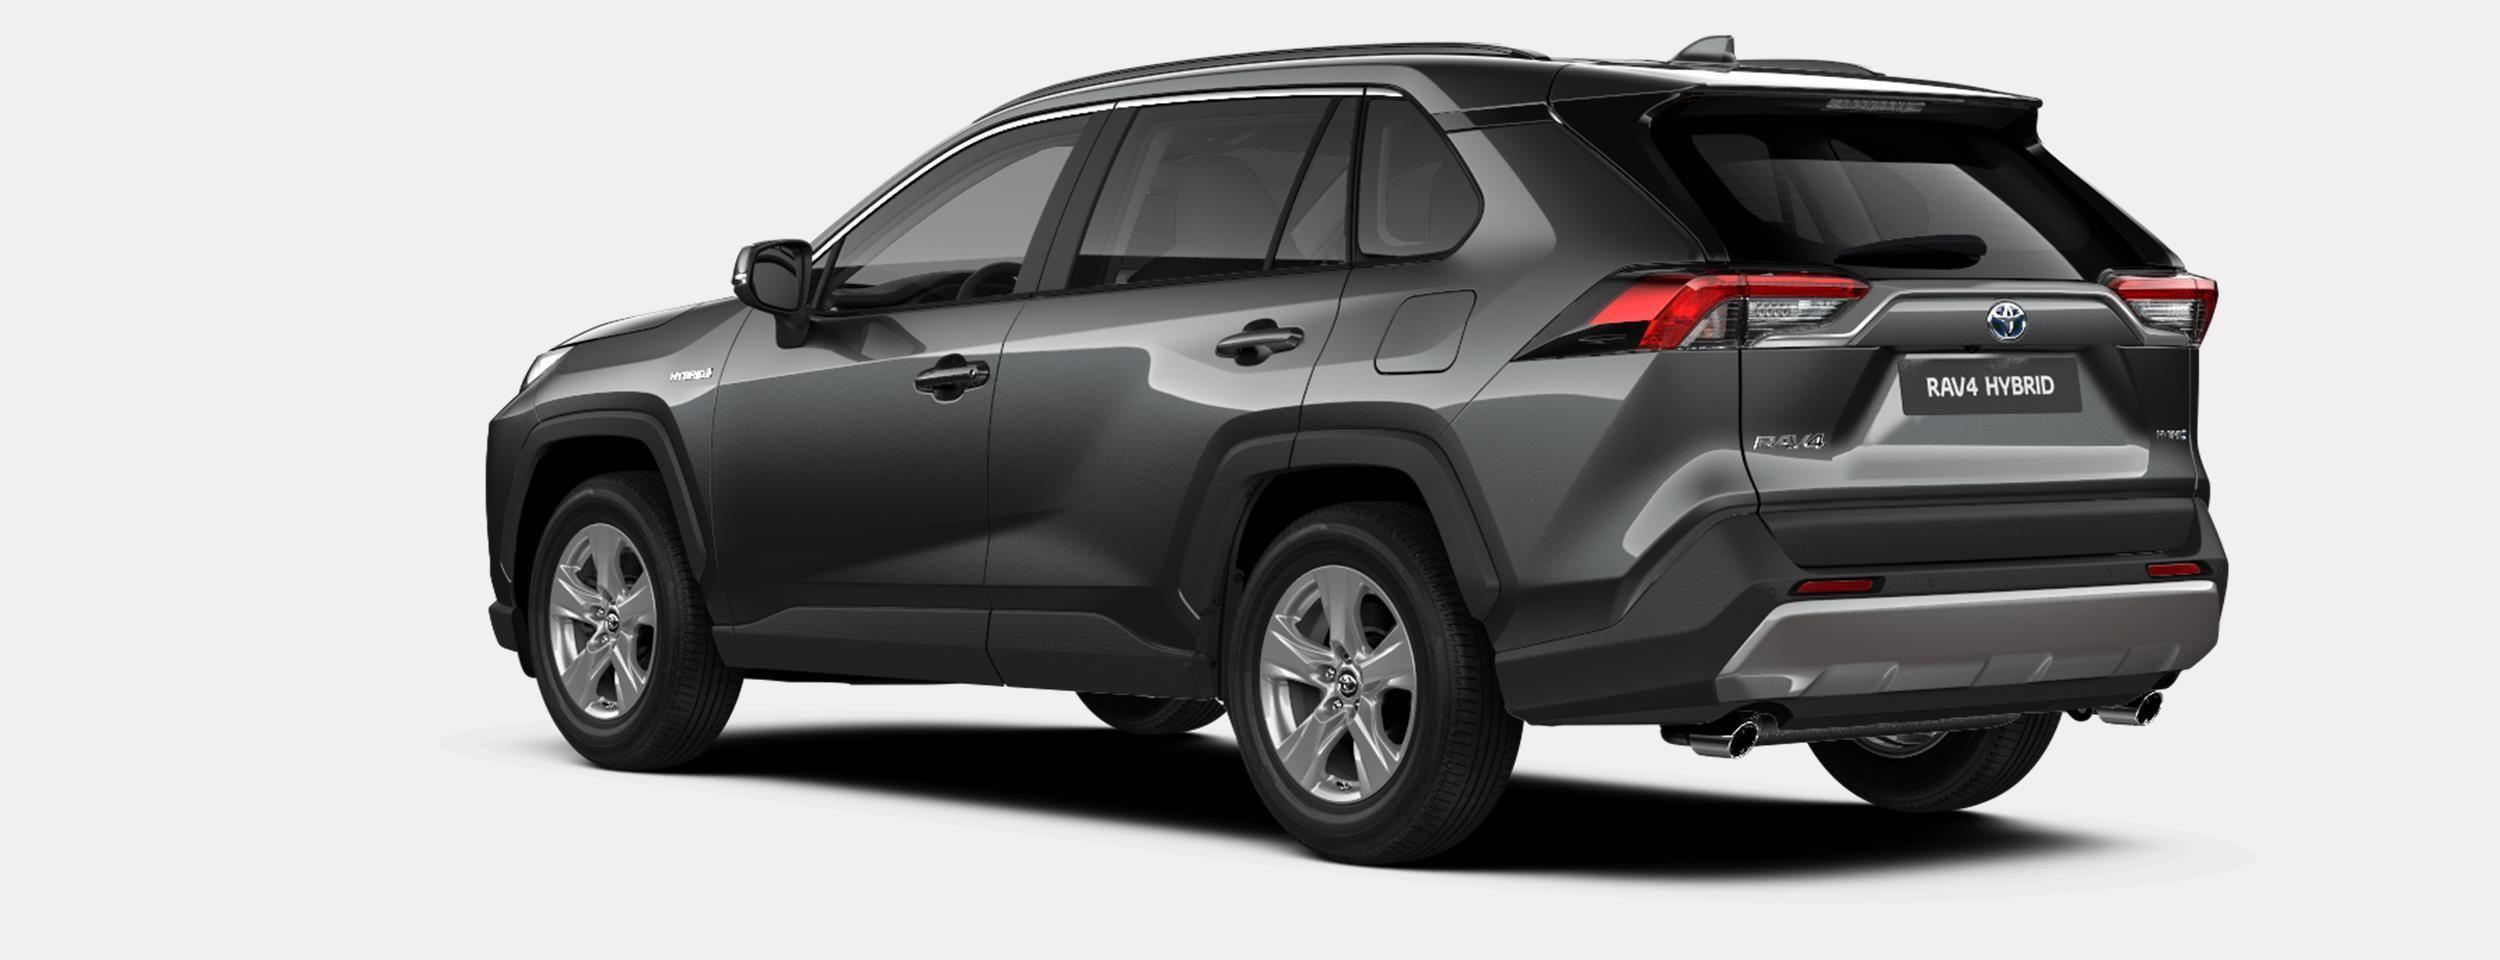 Nieuw Toyota Rav4 5 d. 2.5 Hybrid 2WD e-CVT Premium Plus L 1G3 - DARK GREY METALLIC 4